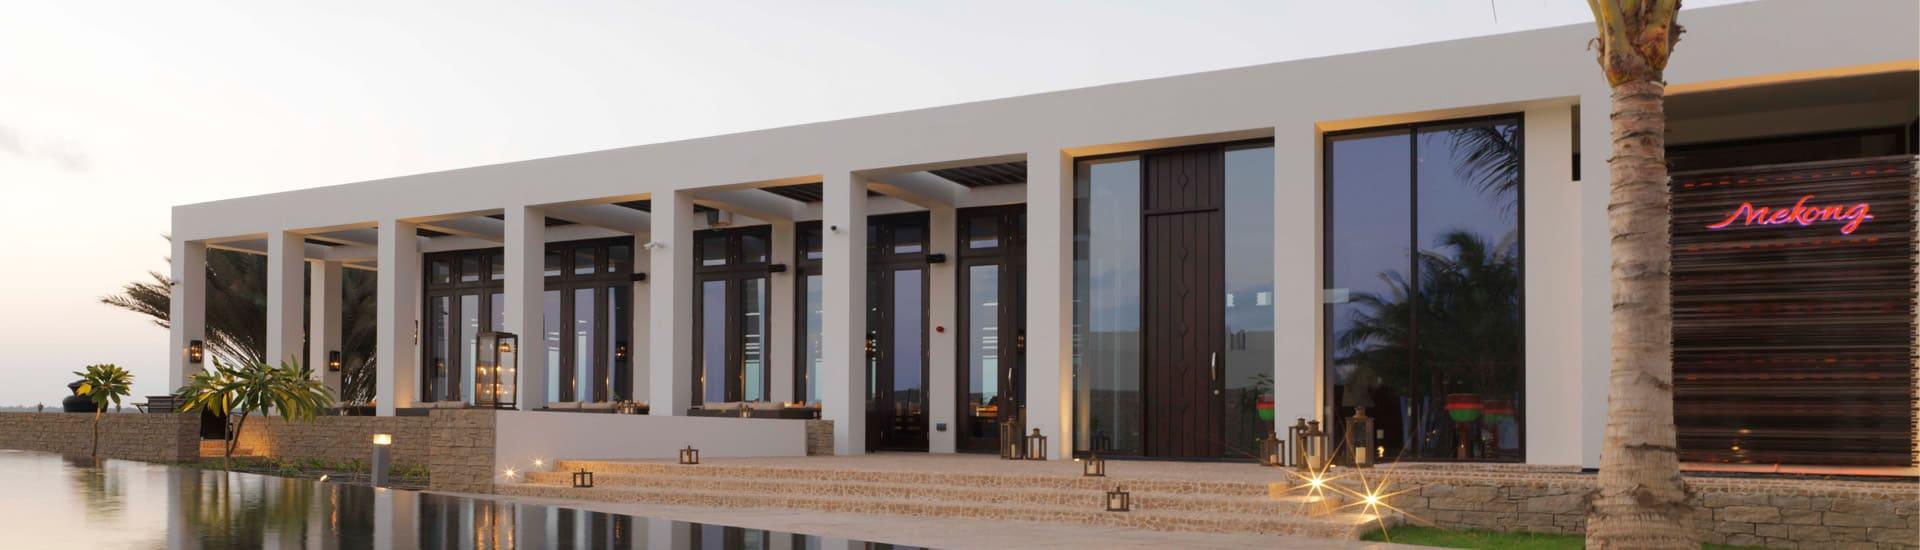 Mekong Restaurant in Oman Exterior View